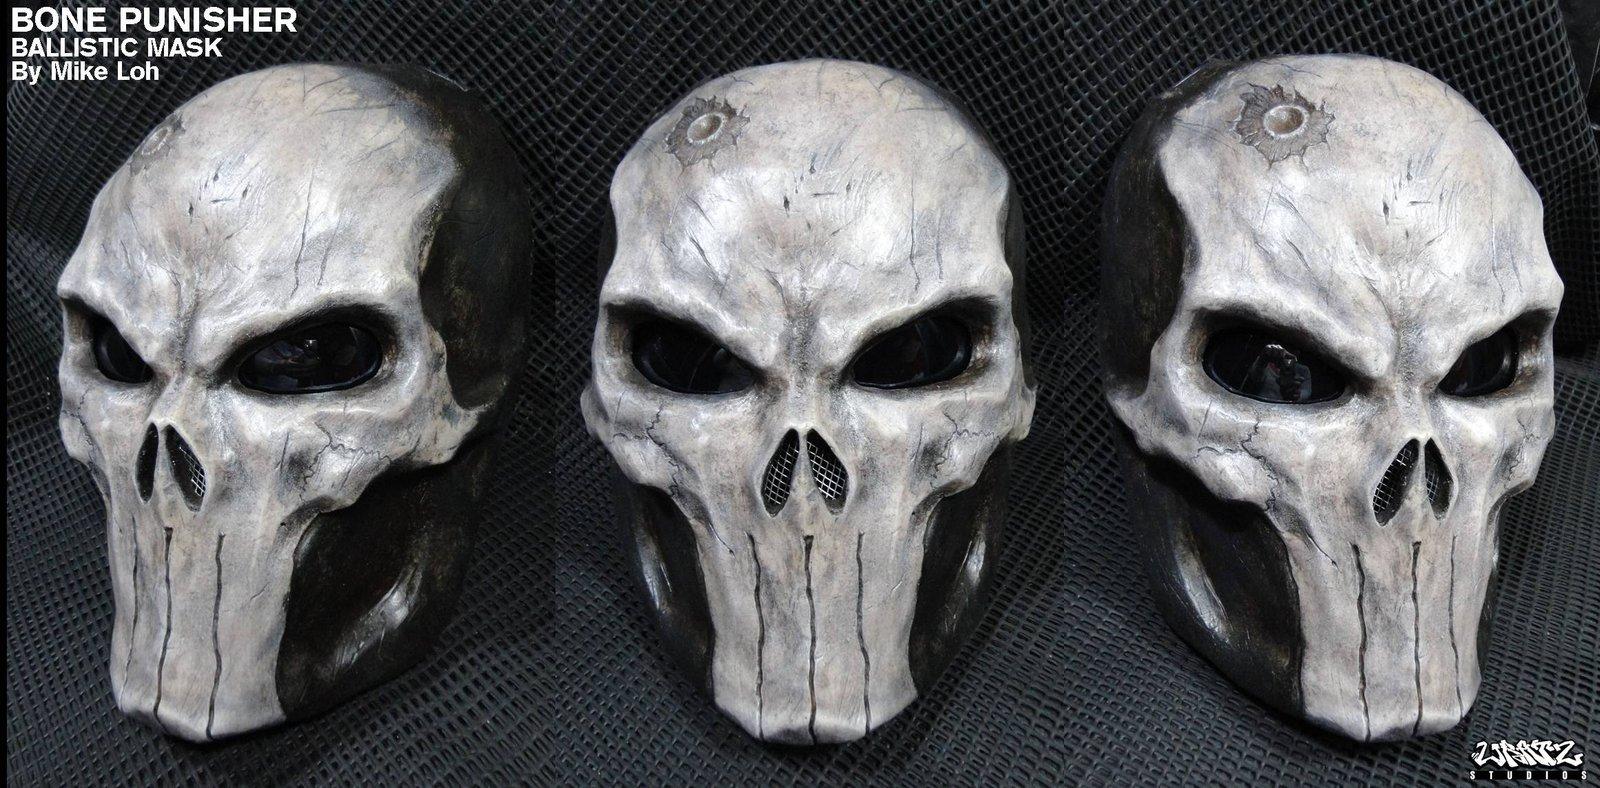 ... www.realporngirlz.com/skull-and-bones-iphone-wallpaper-background.html